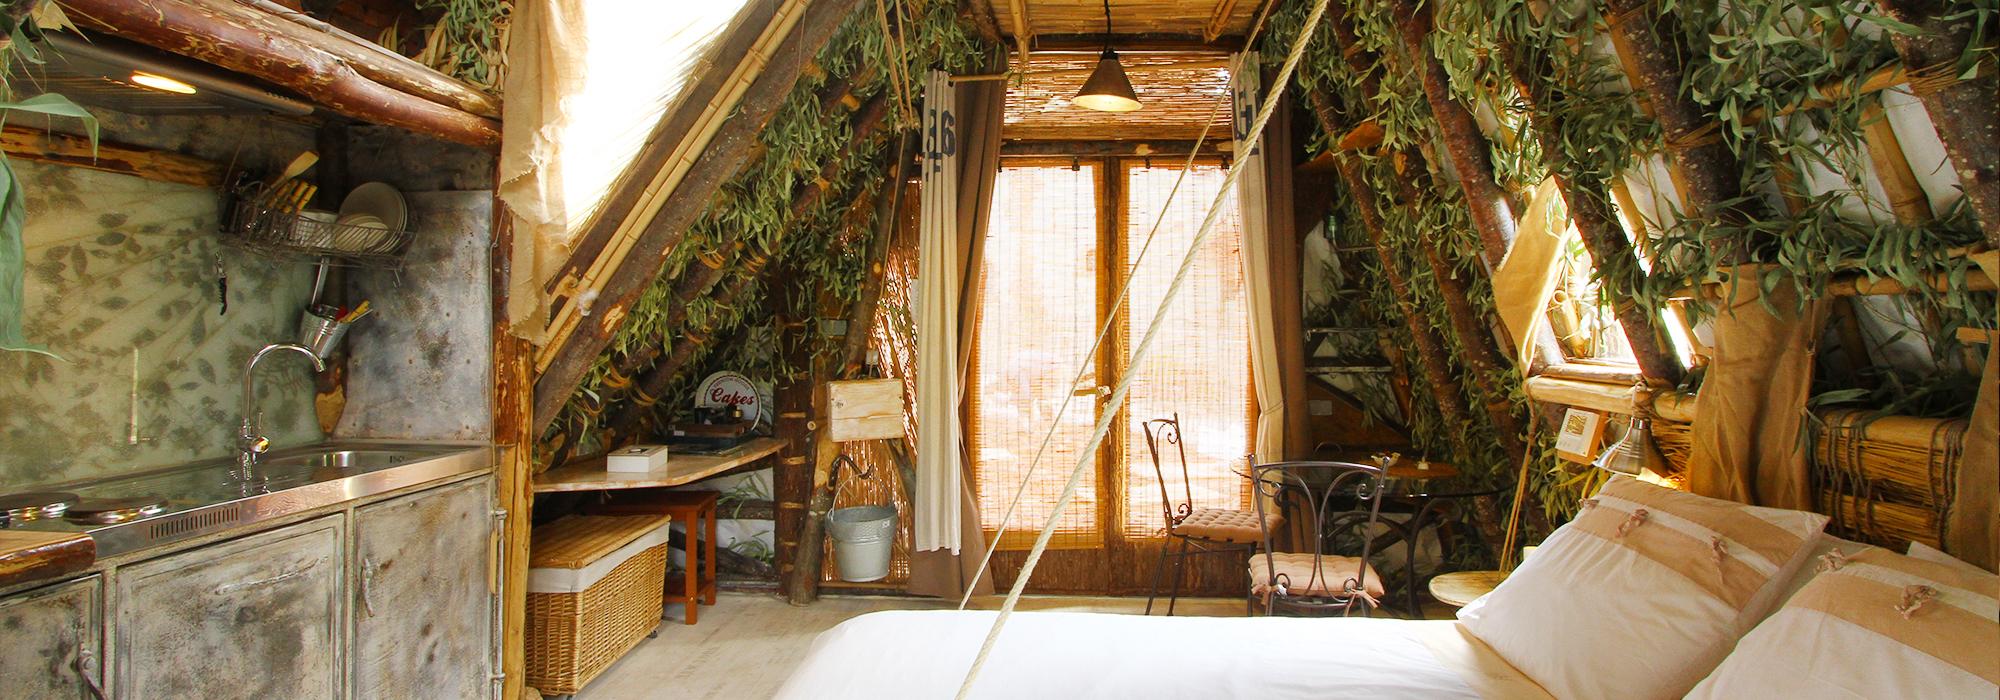 cabane rocamadour chambres d 39 h te g te atypique. Black Bedroom Furniture Sets. Home Design Ideas